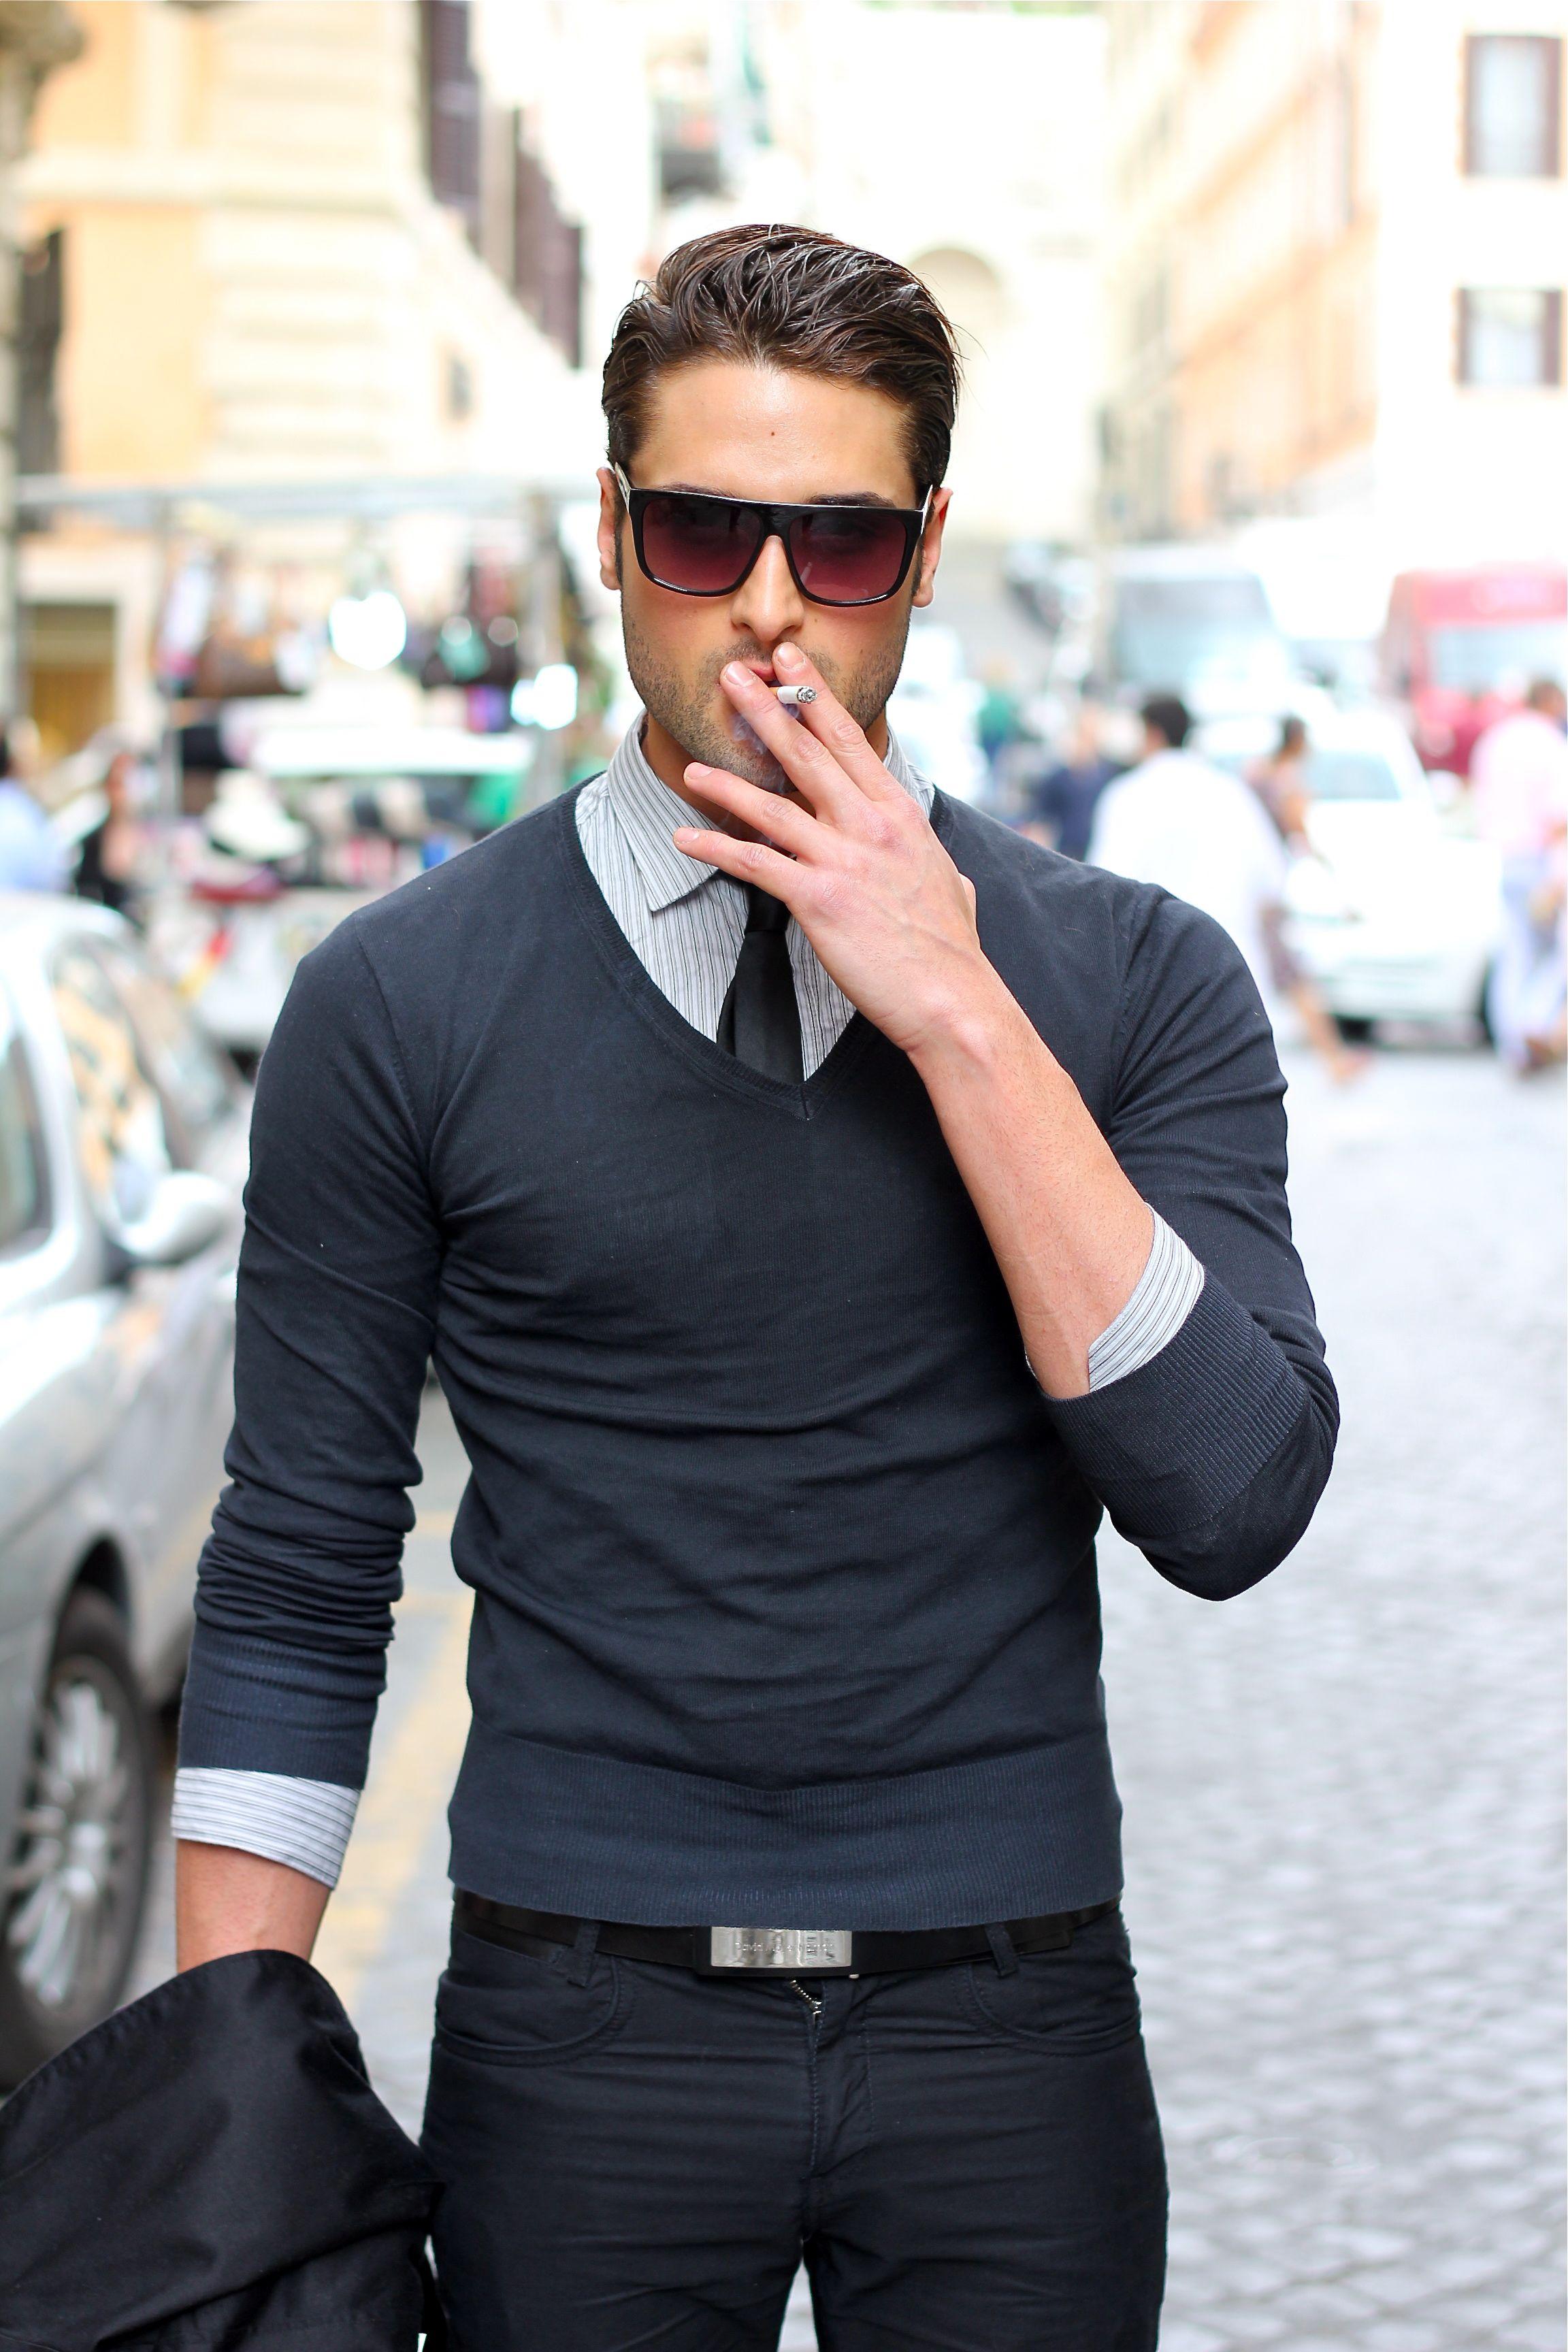 Man dress in style